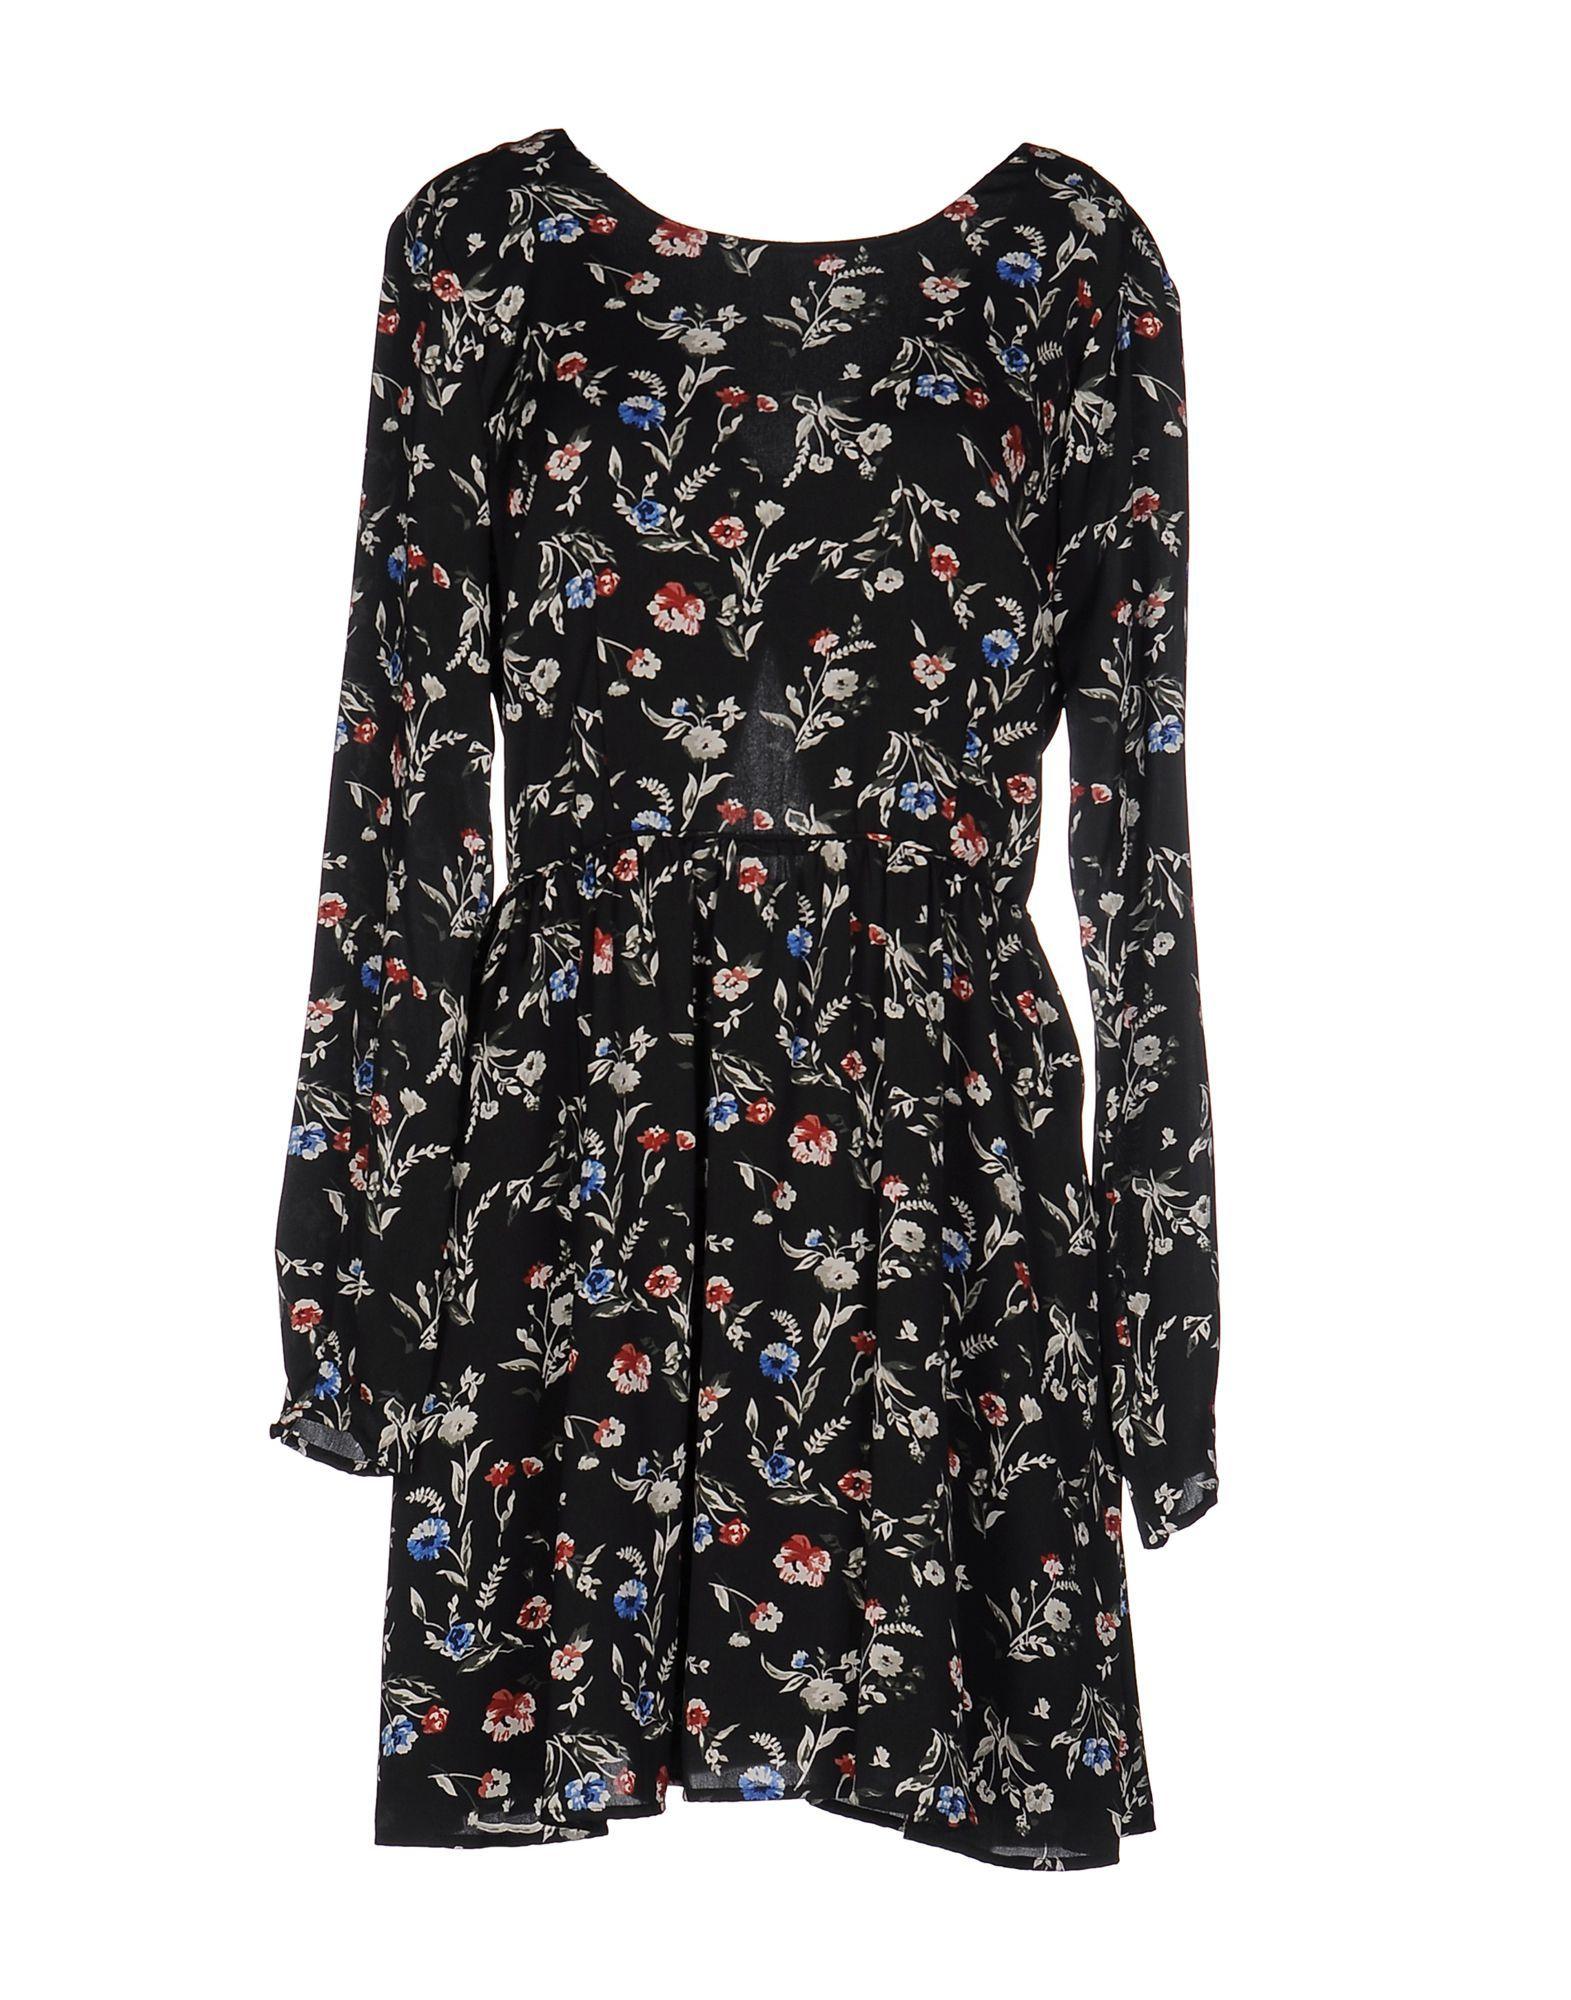 Pepe Jeans Black Print Long Sleeve Dress